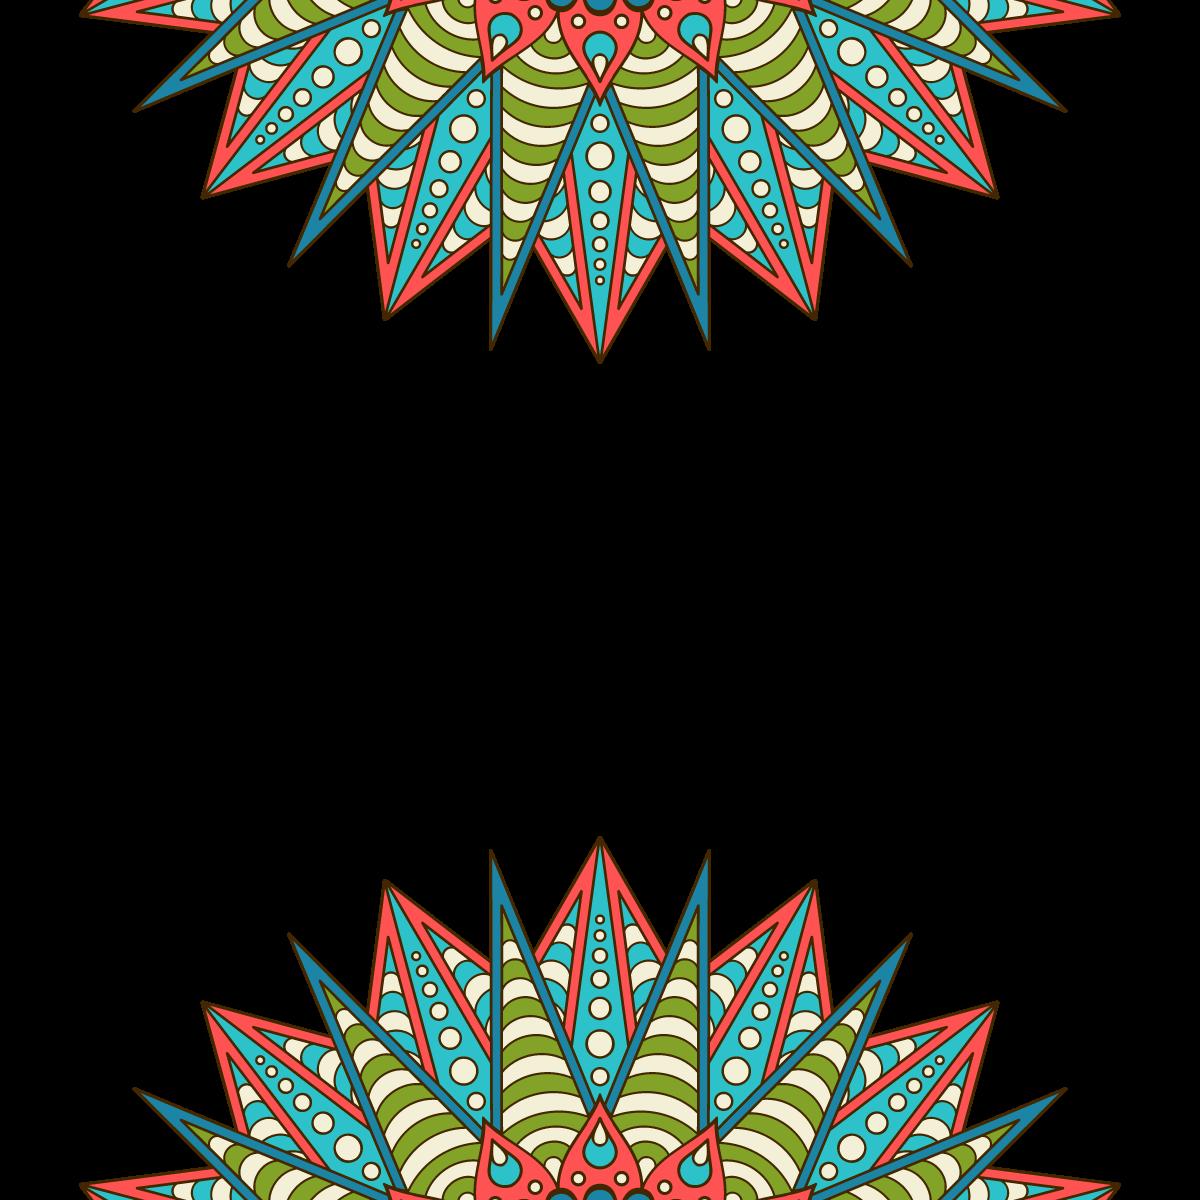 Festival Mandala Patterns Mandala Design Pattern Mandala Design Art Vector Background Pattern